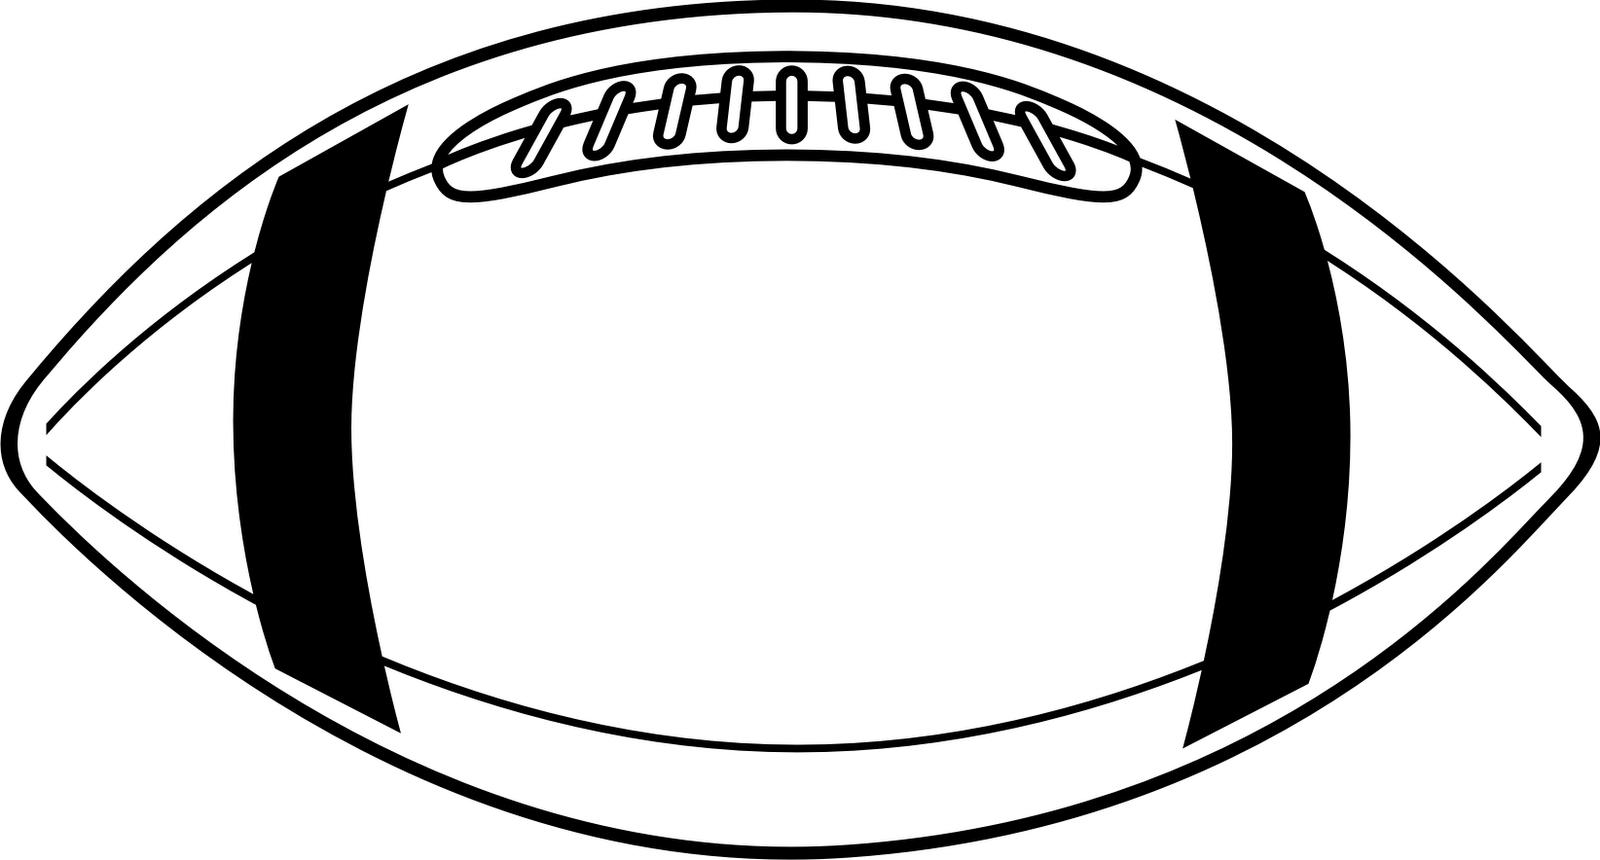 Clip Art Football Stadium Fotosearch Search Clipart Illustration